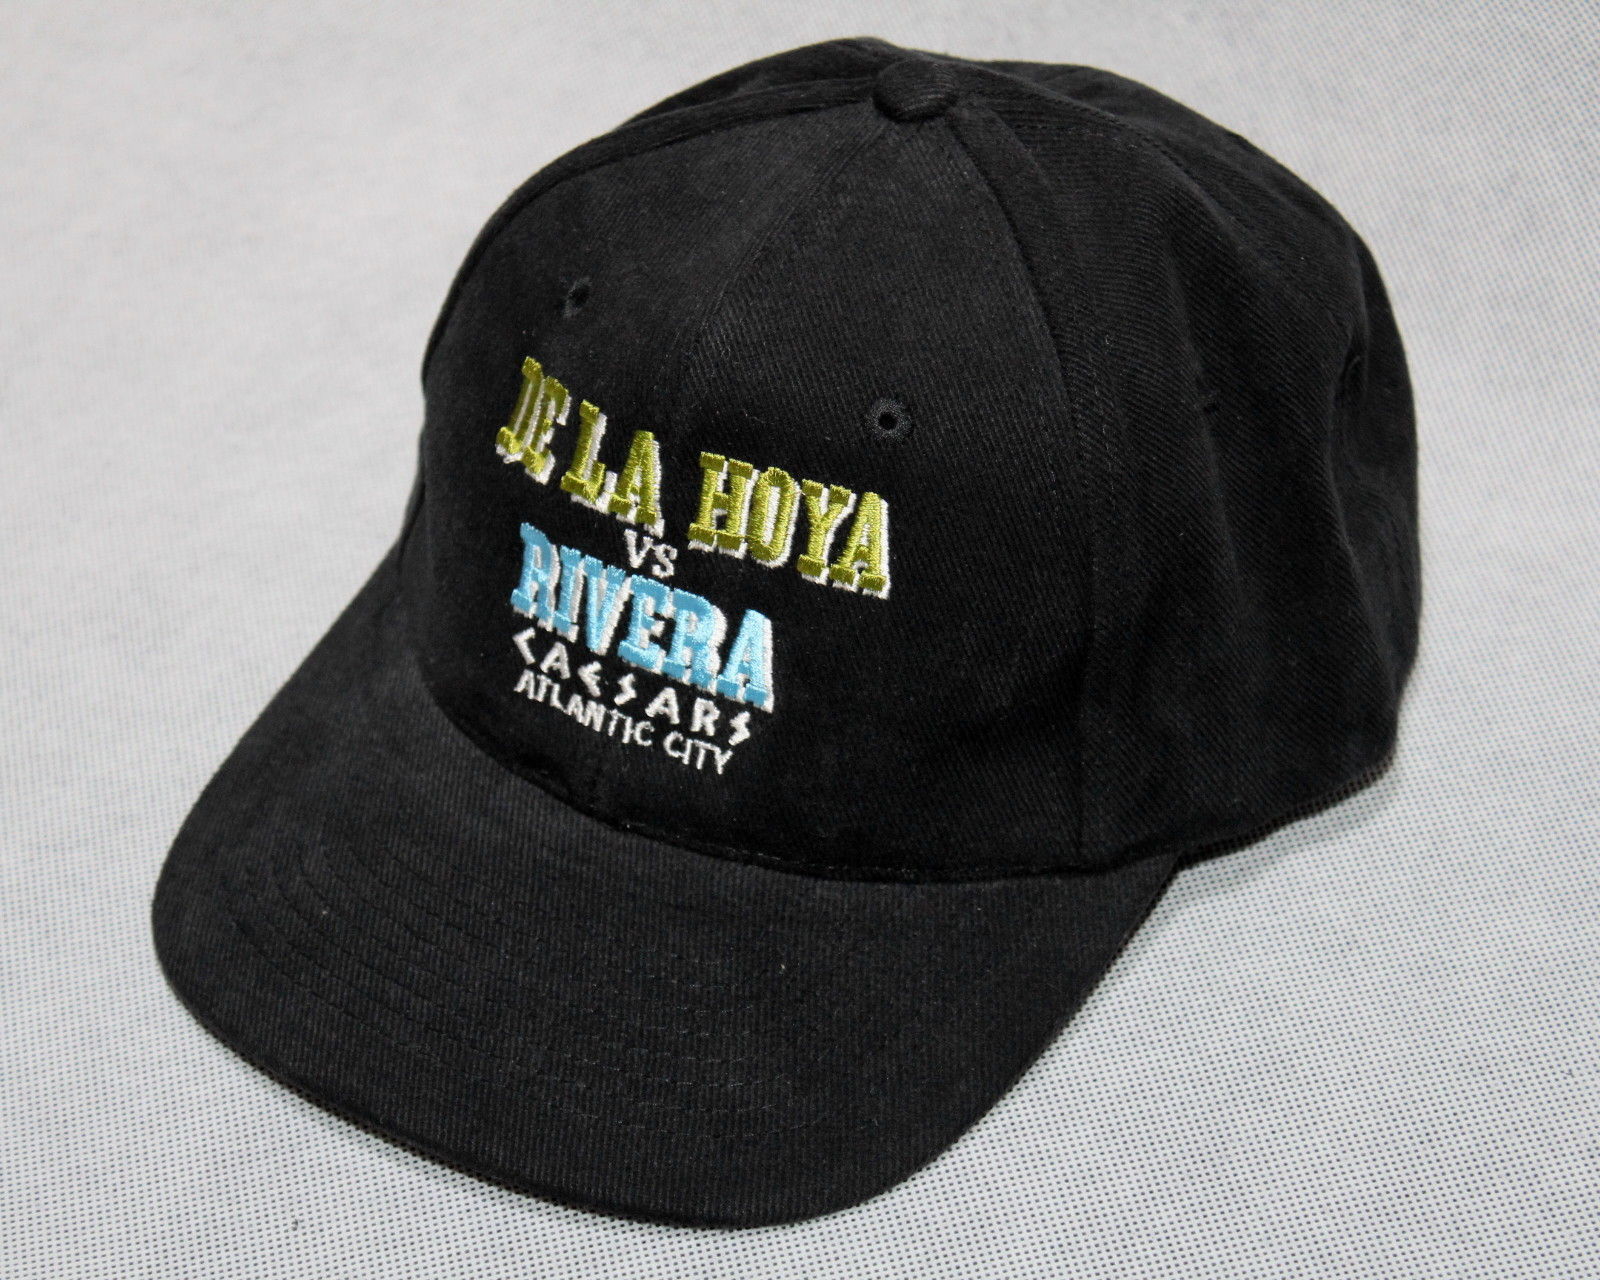 【DEADSTOCK!】Oscar De La Hoya (オスカー・デ・ラ・ホーヤ) vs Wilfredo Rivera (ウィルフレド・リベラ) ベースボールキャップ | ironfist